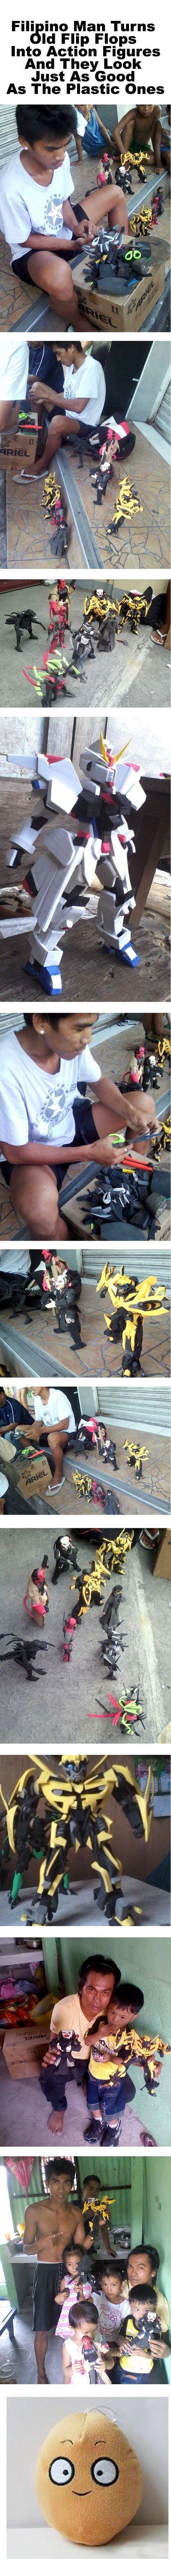 Toy-making Level: Asian